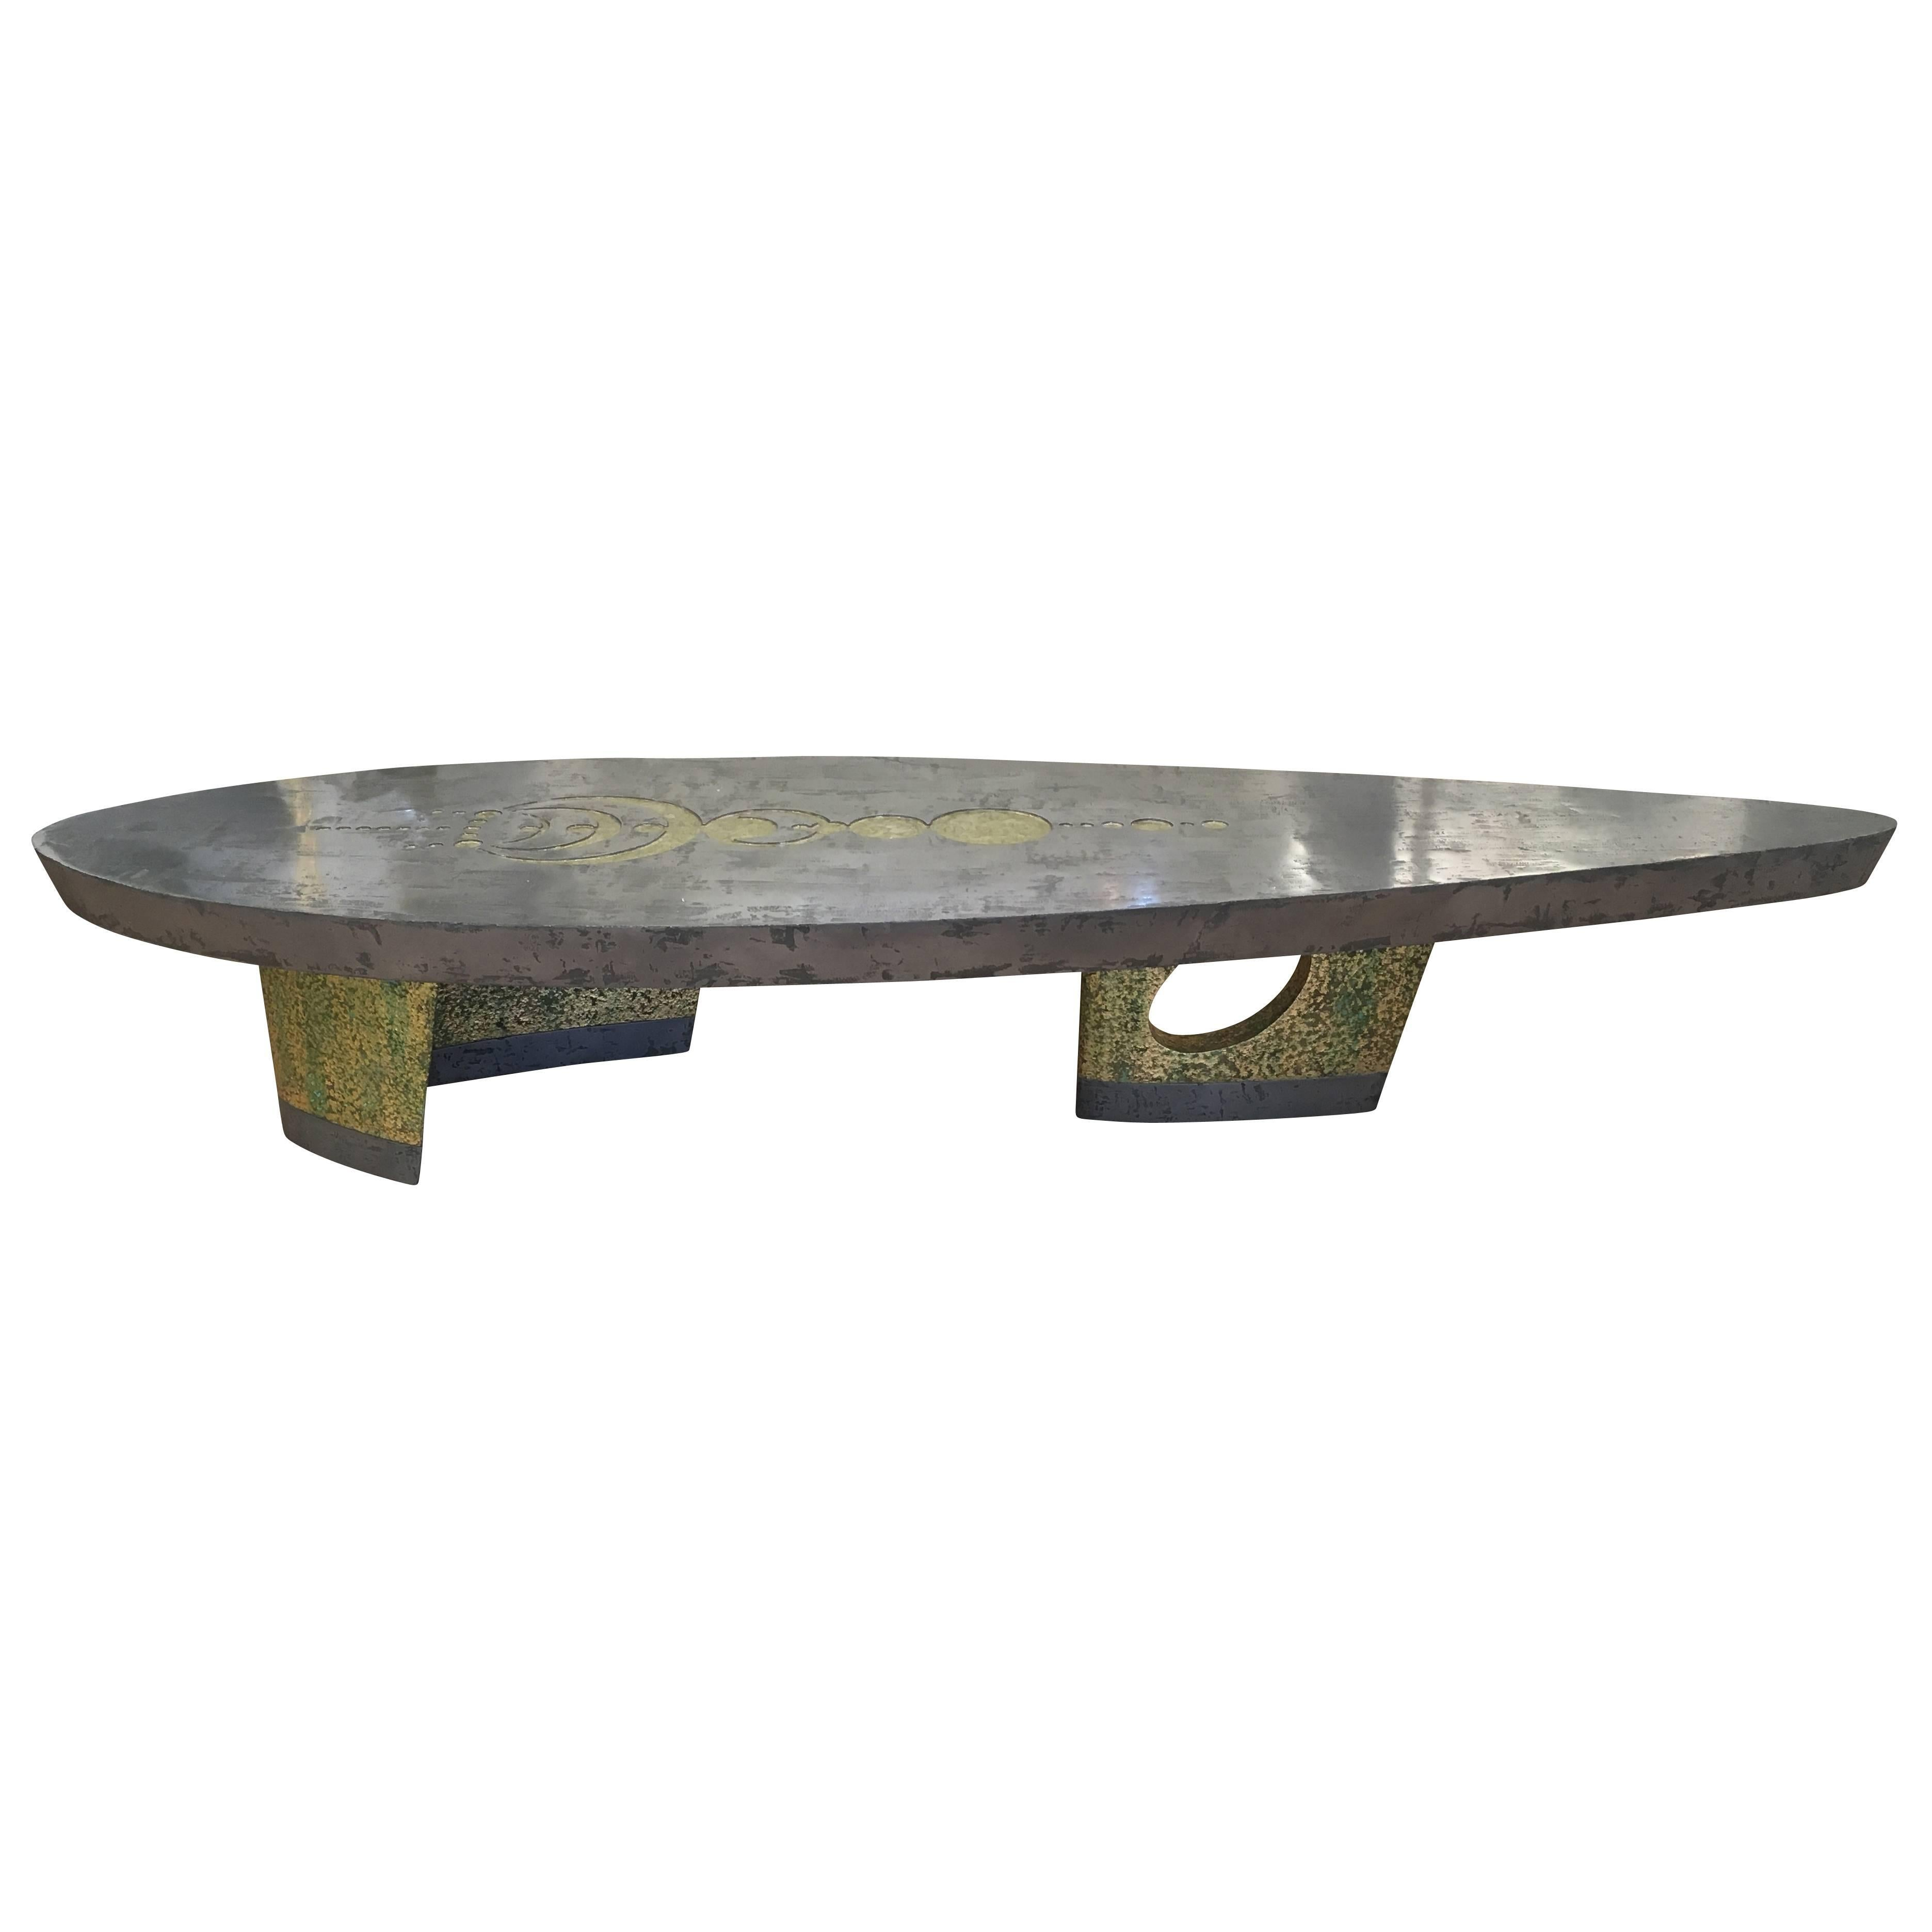 Organic Modern One Of A Kind U201cNaveu201d Coffee Table For Sale